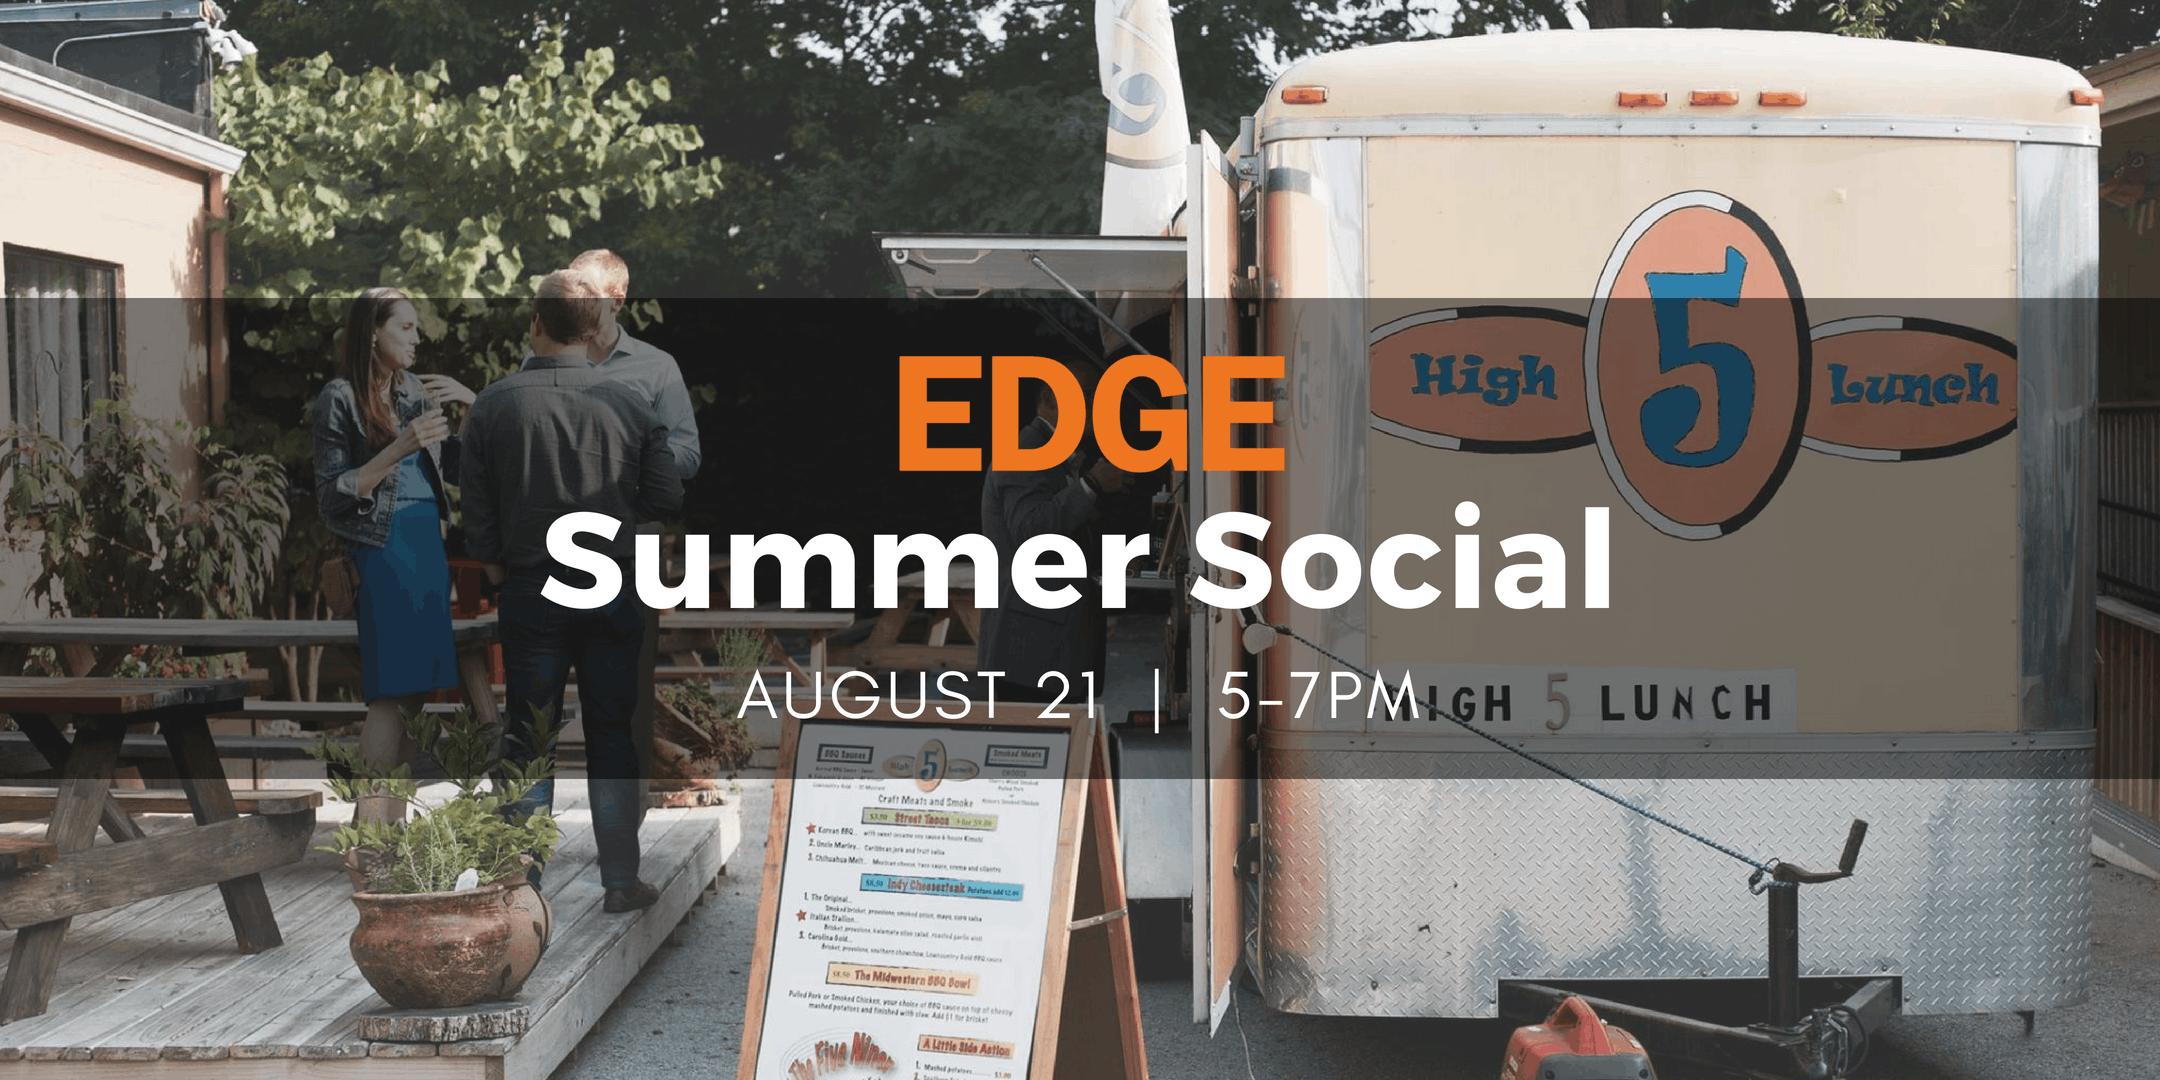 EDGE Summer Social